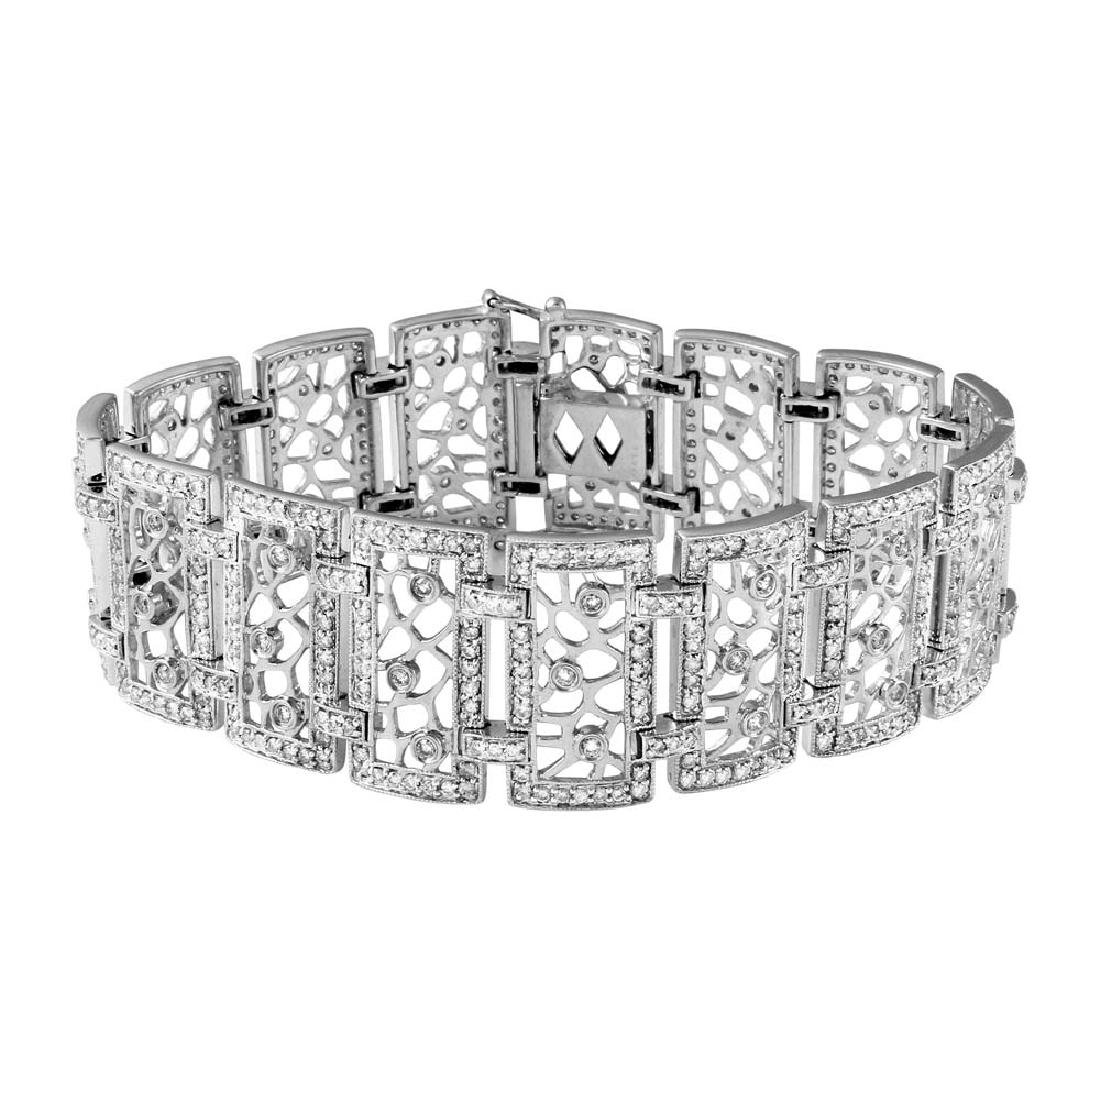 Genuine 4.14 TCW 14K White Gold Ladies Bracelet